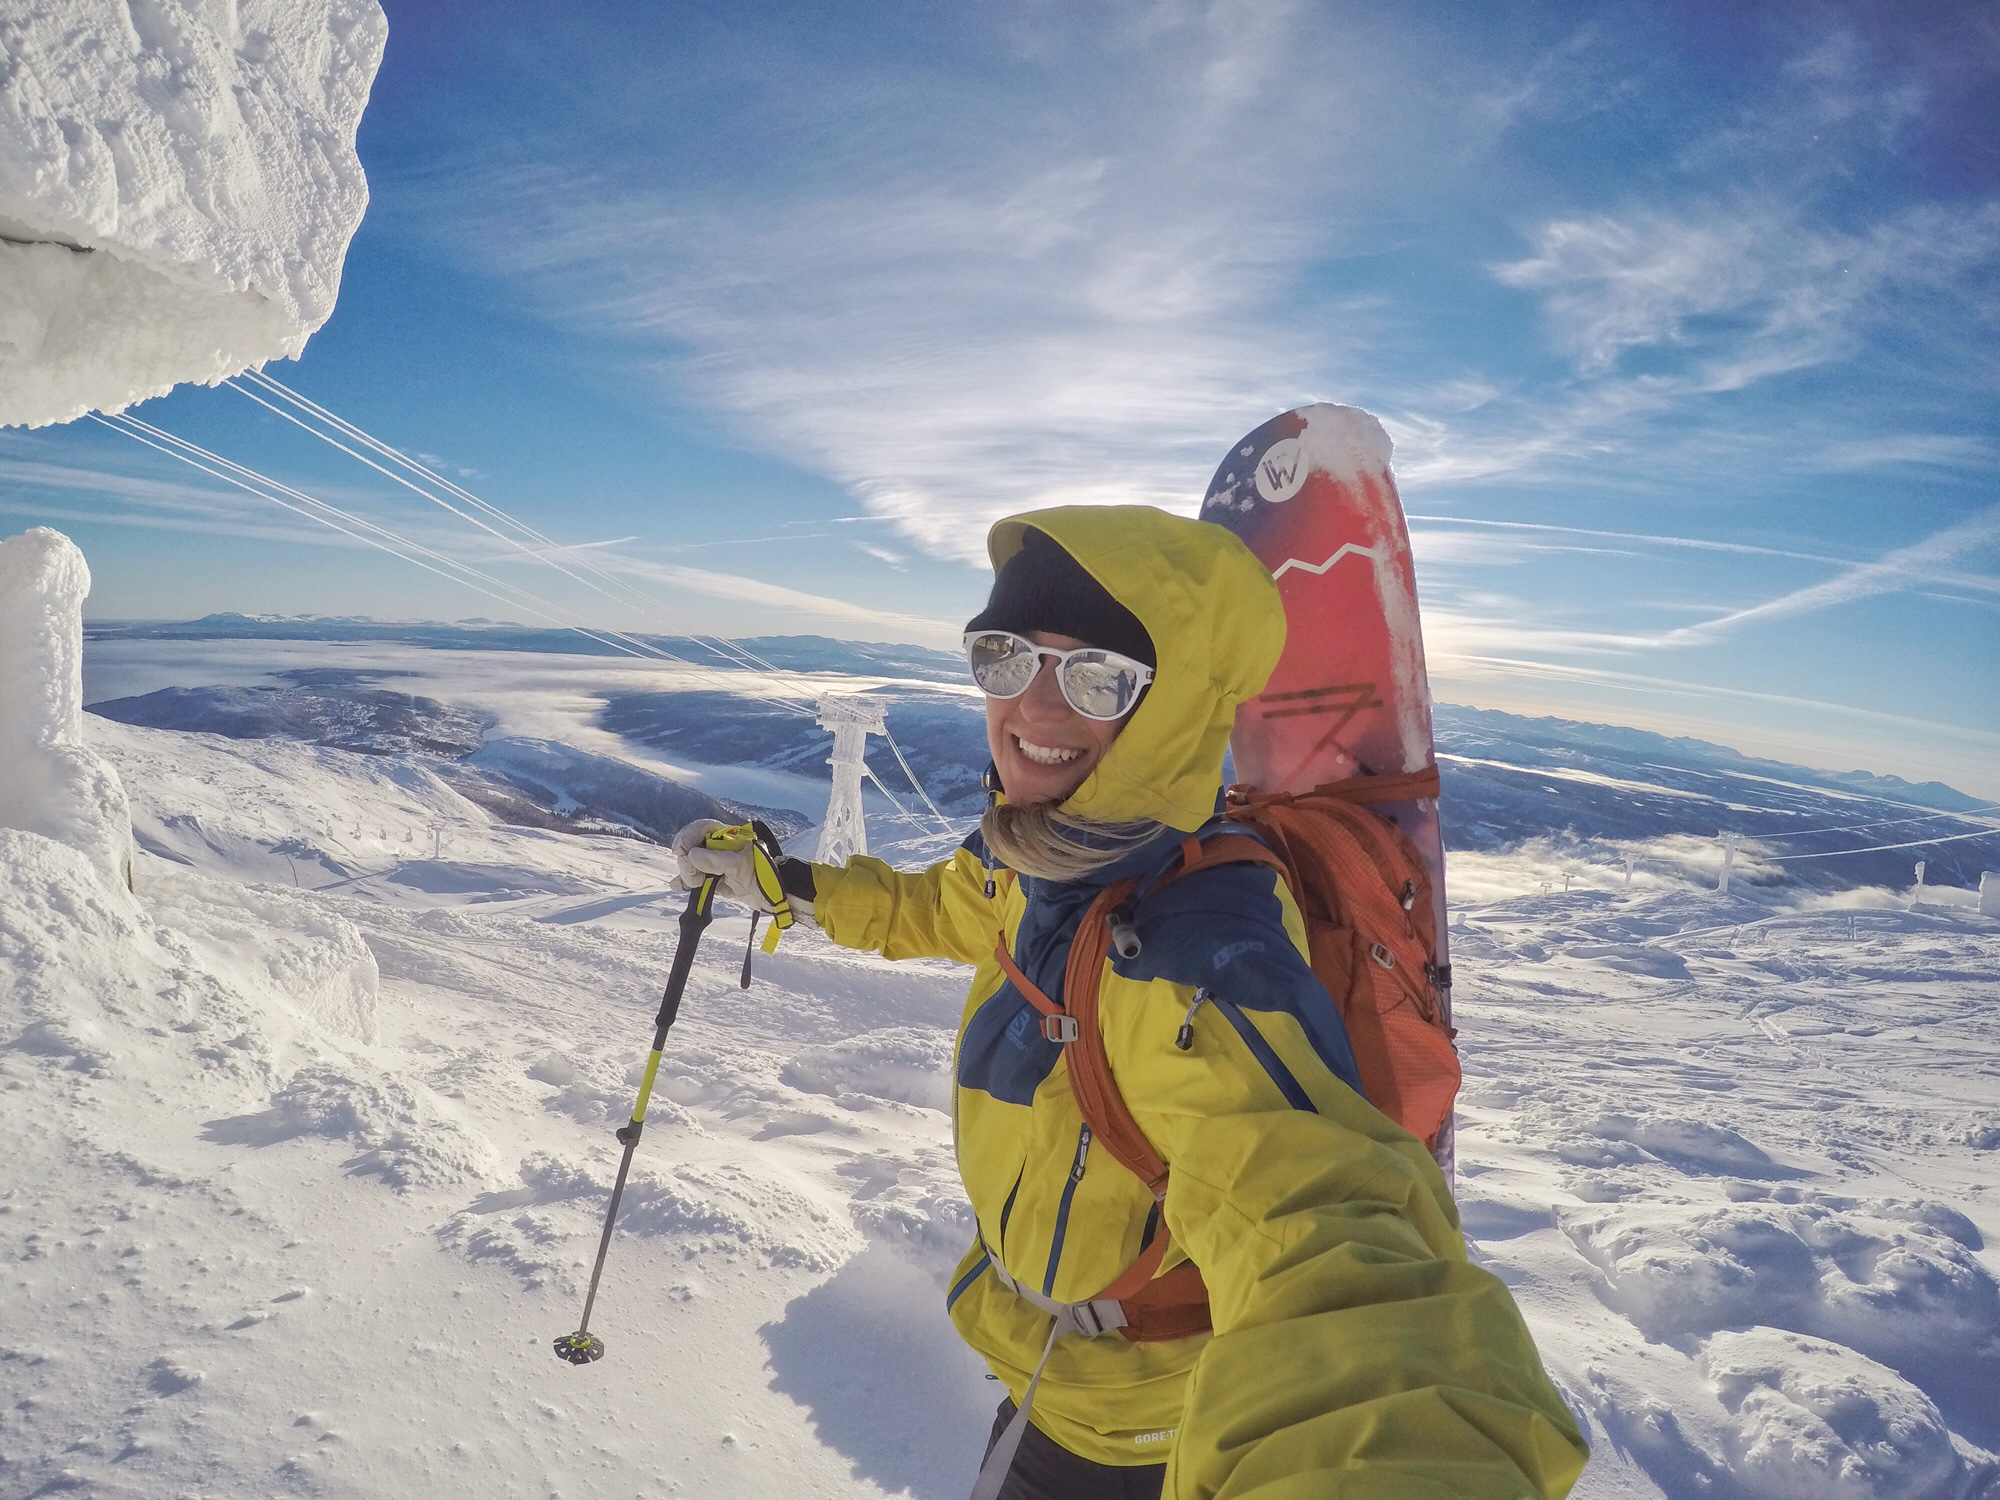 Snowboard Micayla Gatto